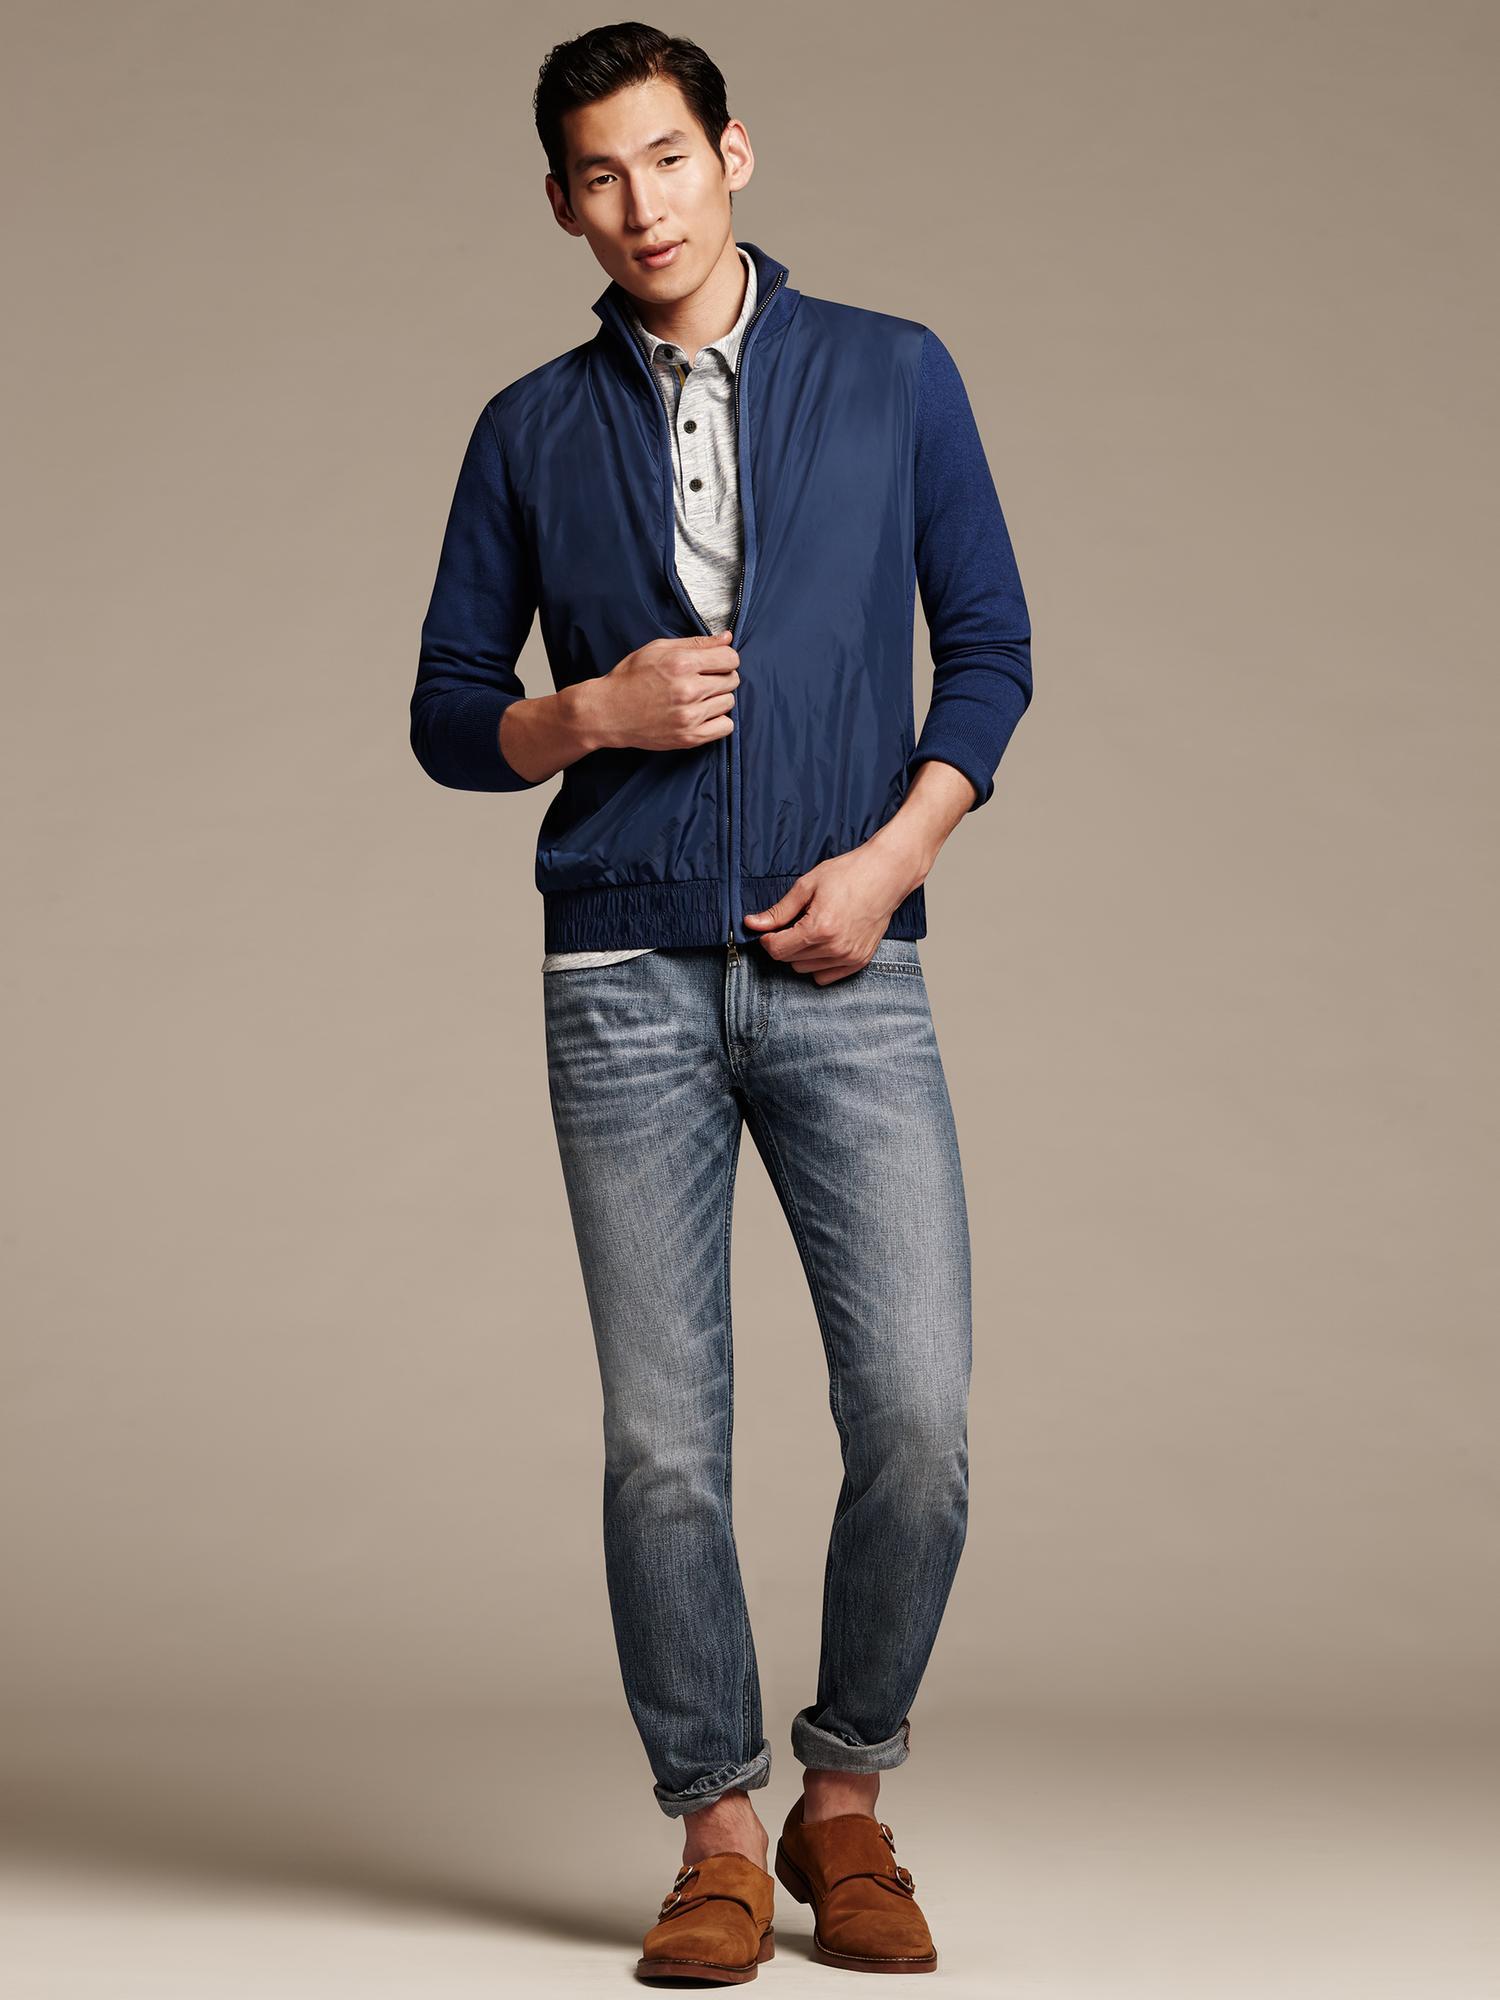 d66df3d0 Banana Republic Vintage Straight-Fit Indigo Jean in Blue for Men - Lyst